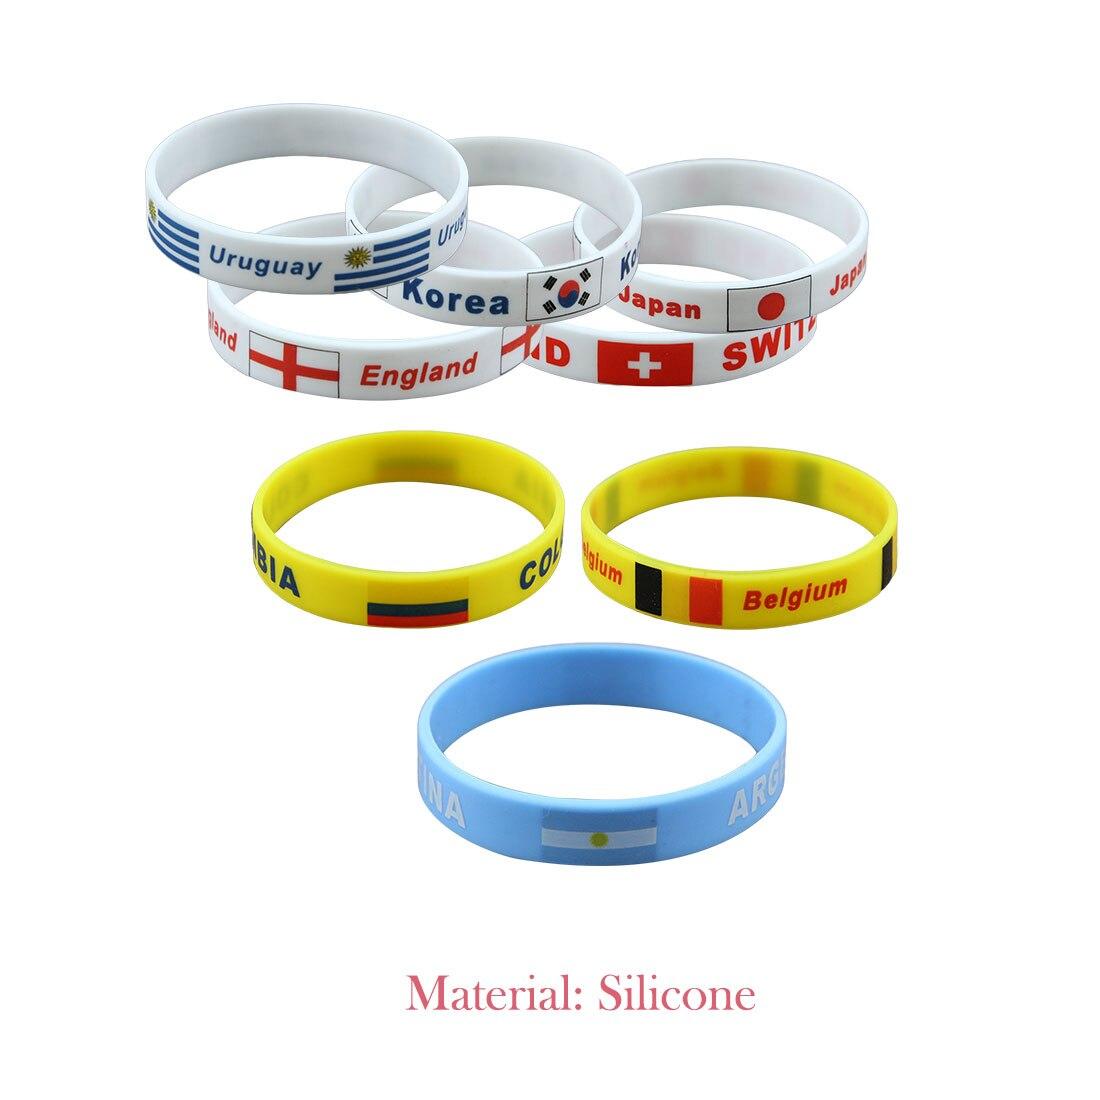 1pcs Football Fans Bracelet Soccer Fan Accessories Football Silicone Bracelet Cheerleading Supplies